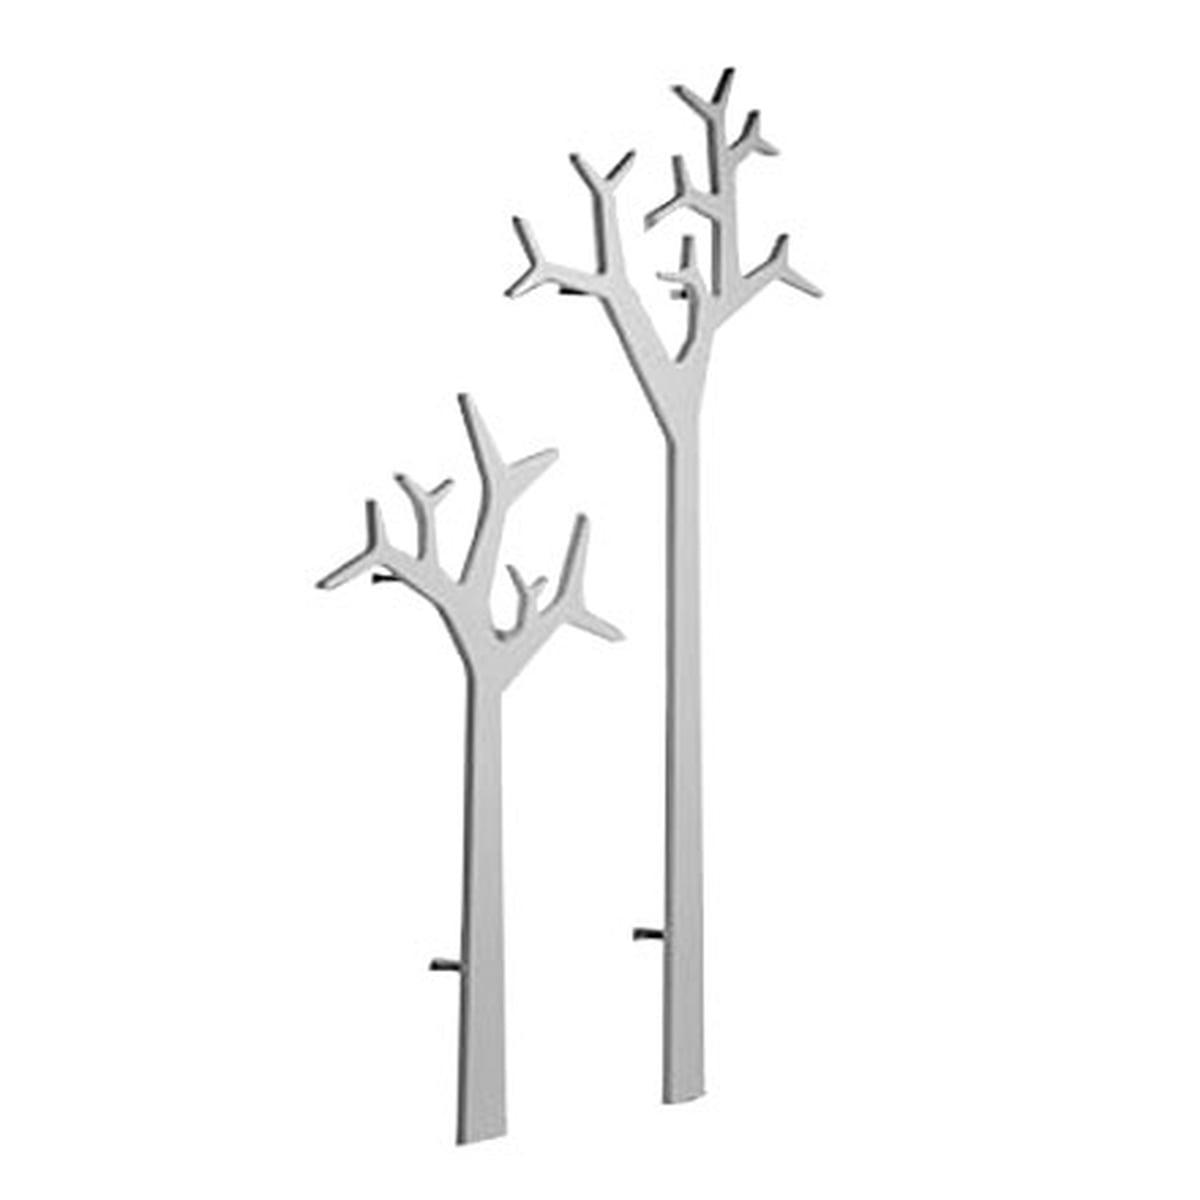 Swedese Tree Porte Manteau Mural